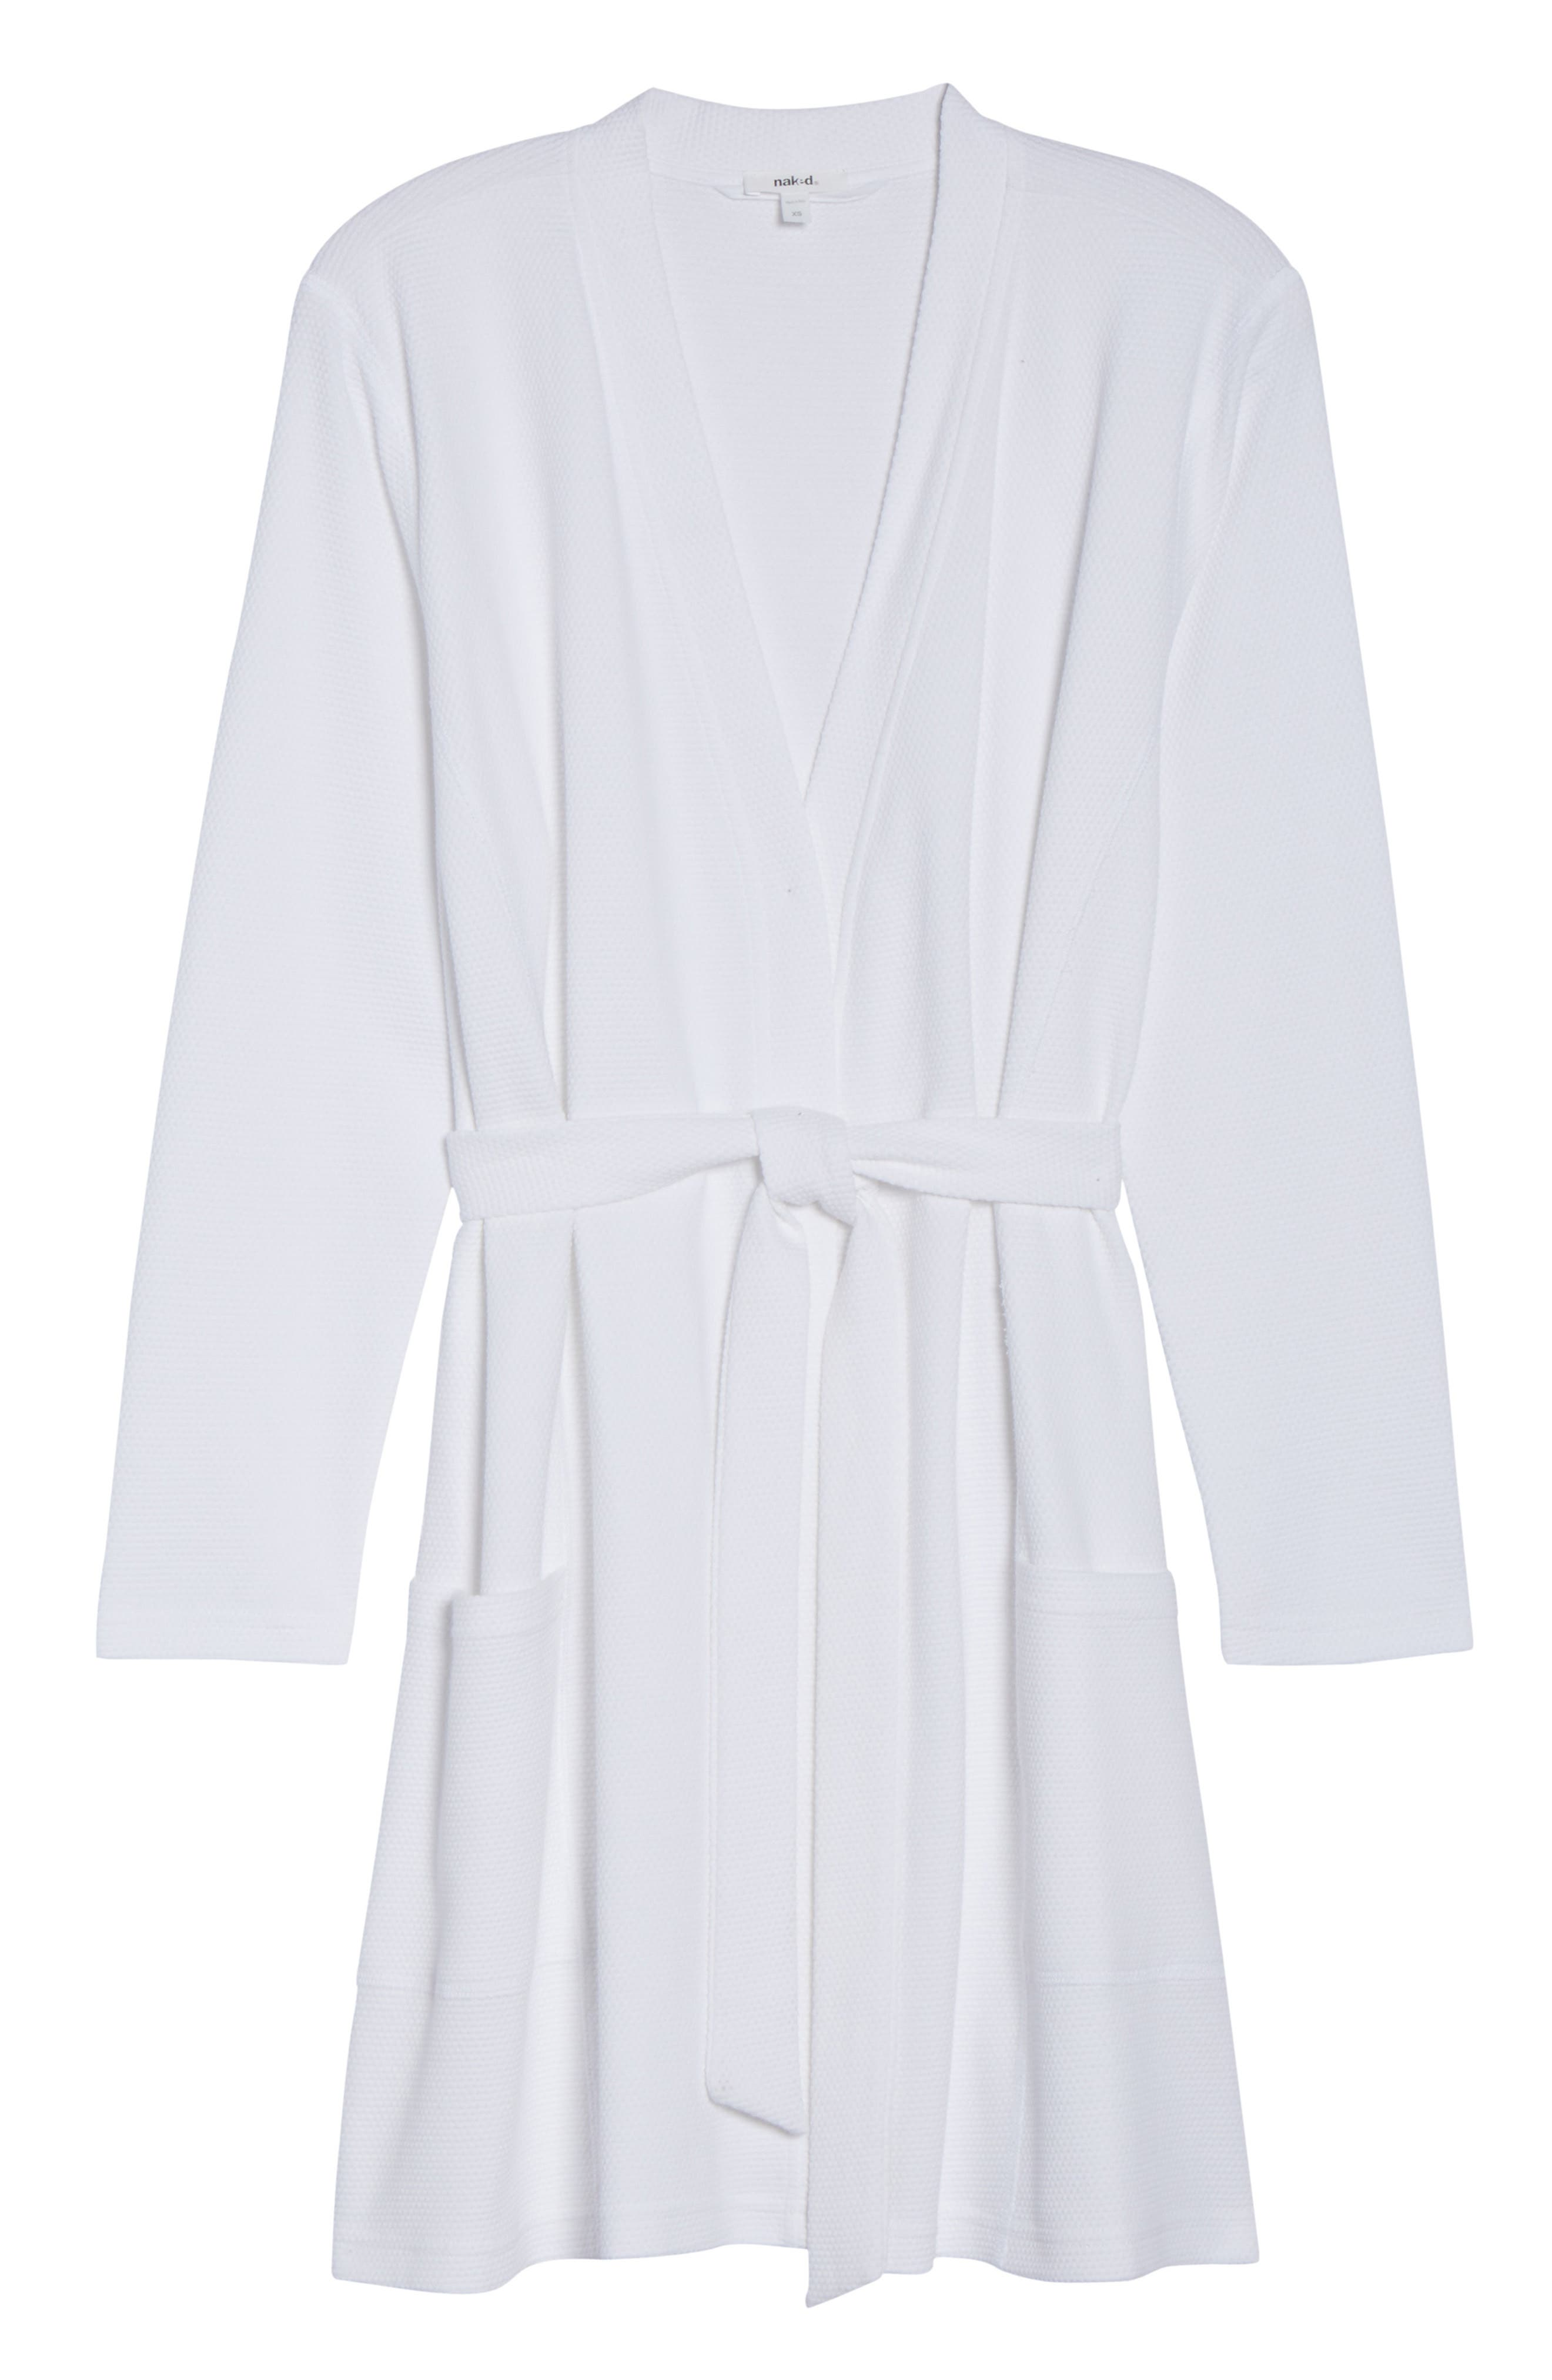 Short Robe,                             Alternate thumbnail 6, color,                             100